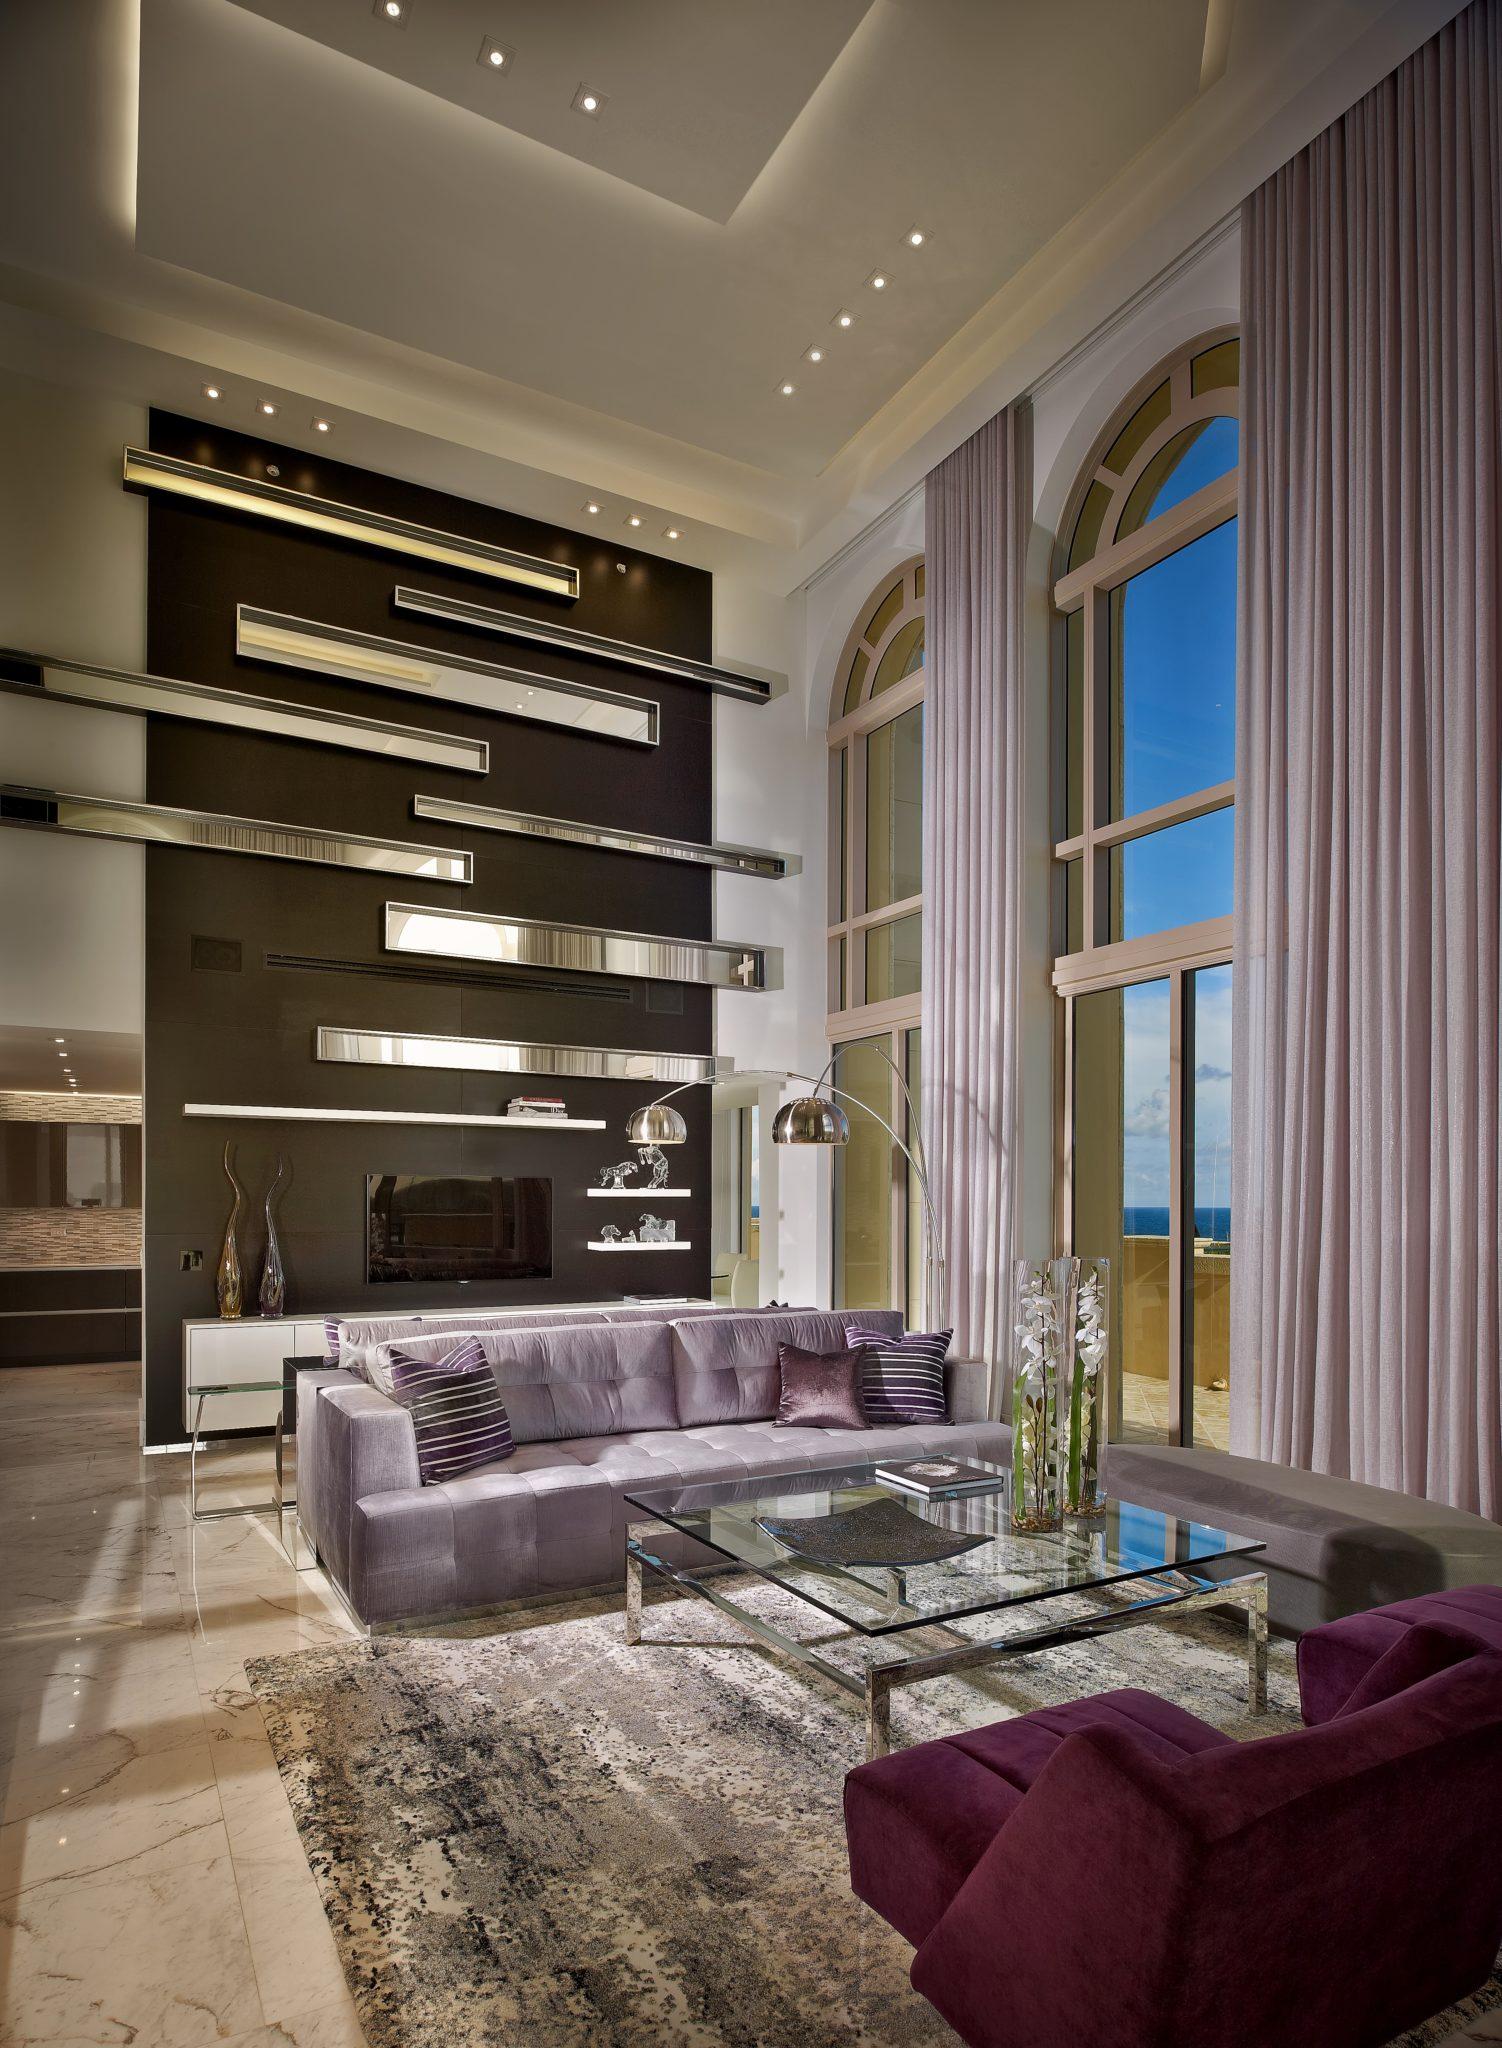 Miami, Florida, propertyby Pepe Calderin Design